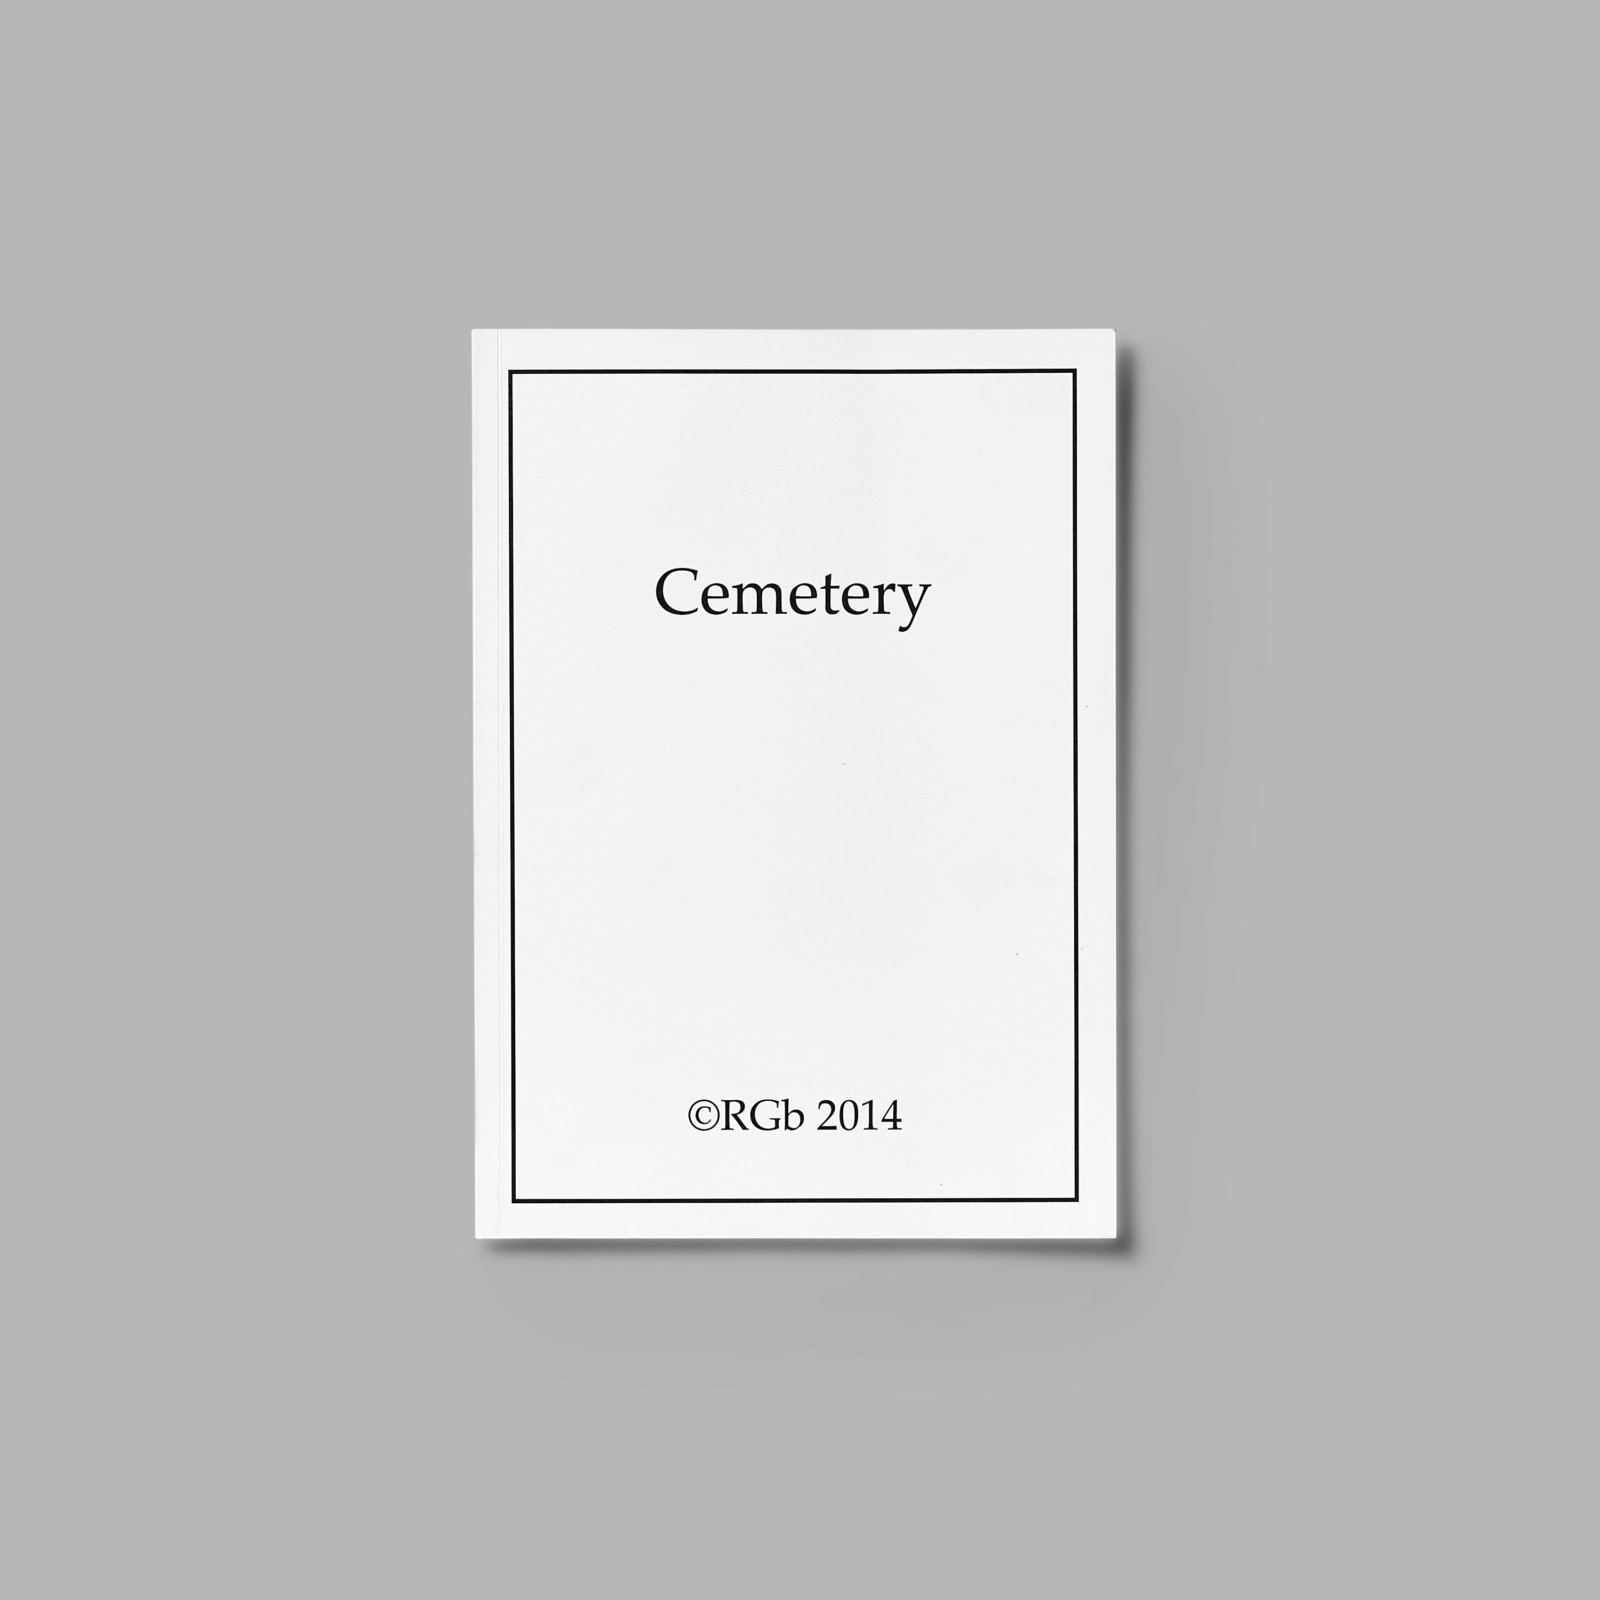 cemetry_head